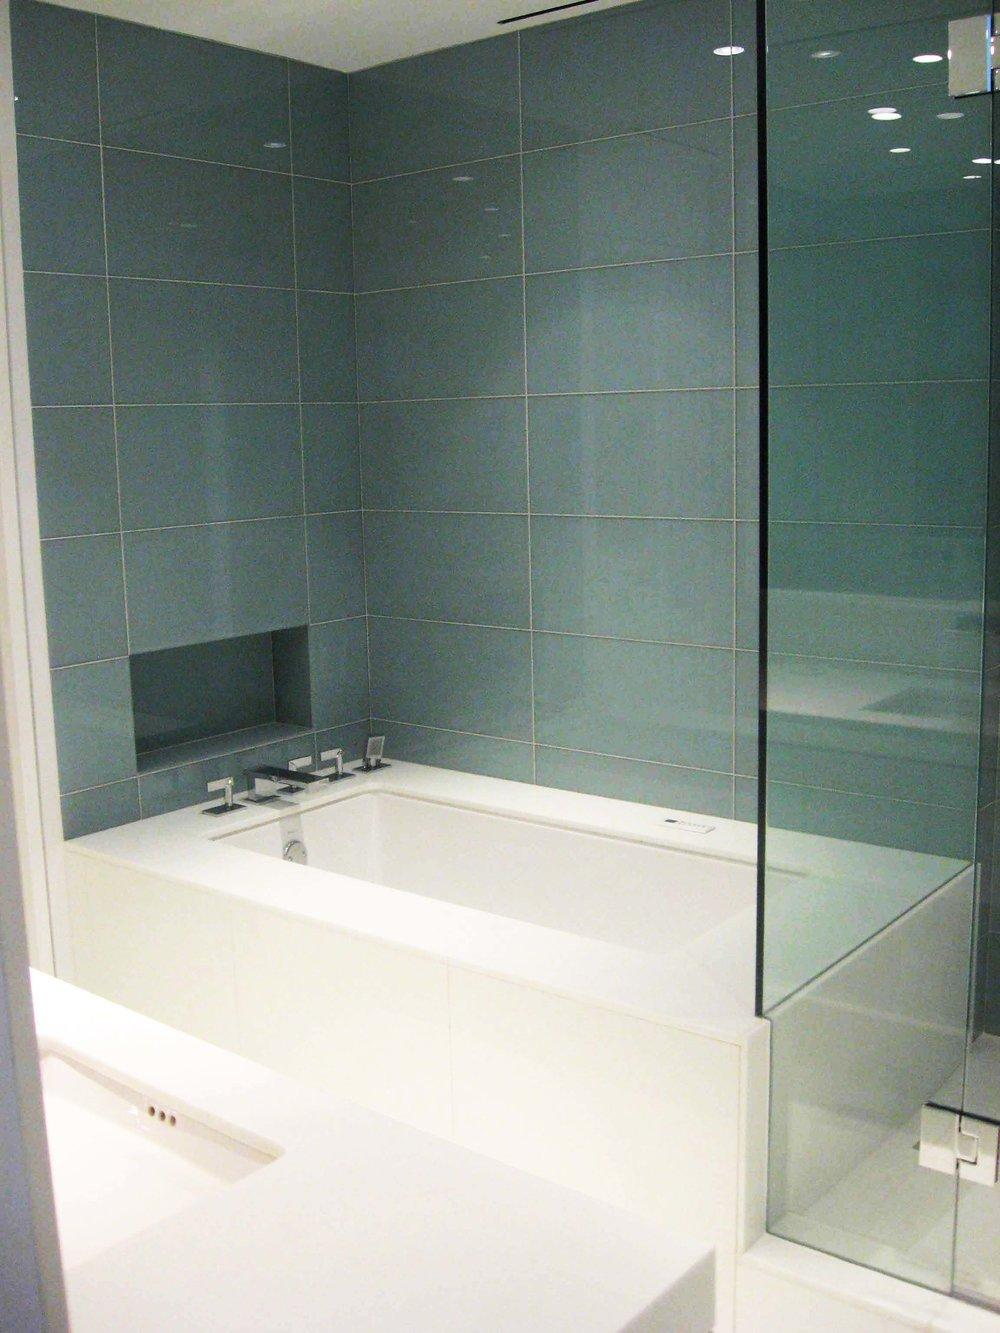 Rehnert m-bath-tub-LR.jpg